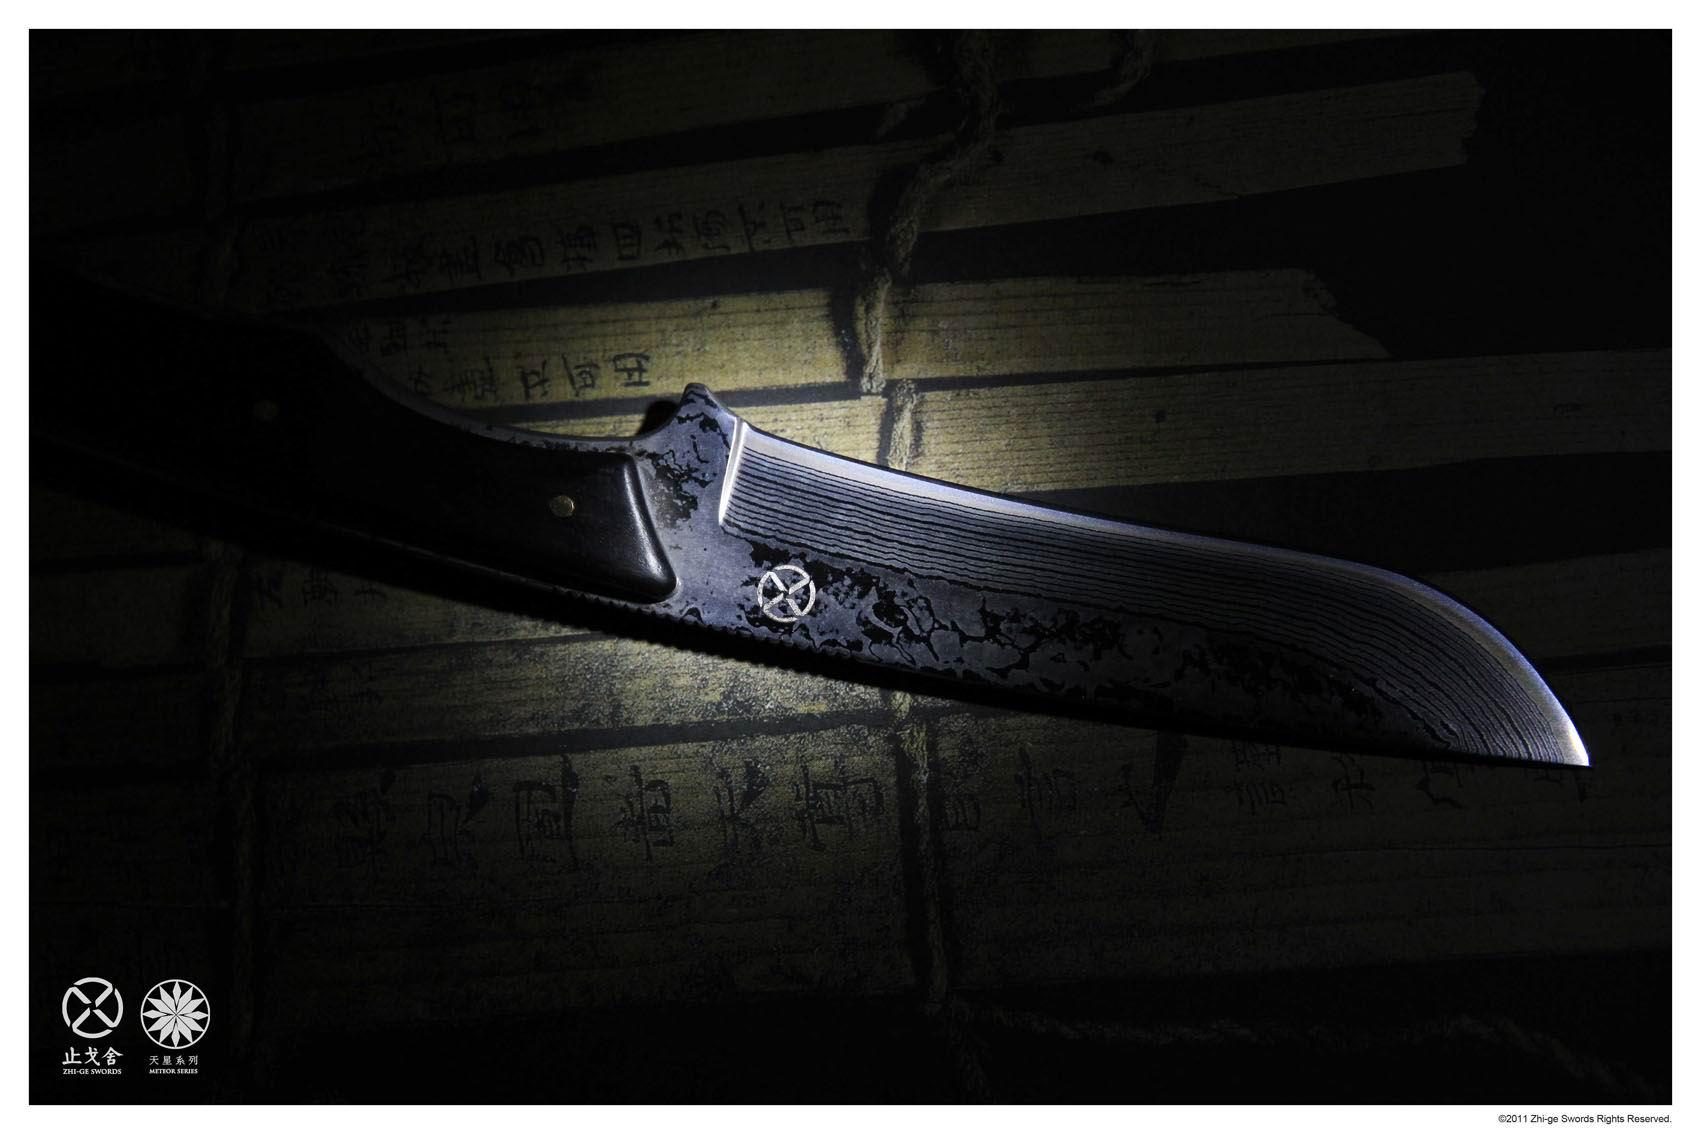 zhi-ge swords han silk 6.jpg